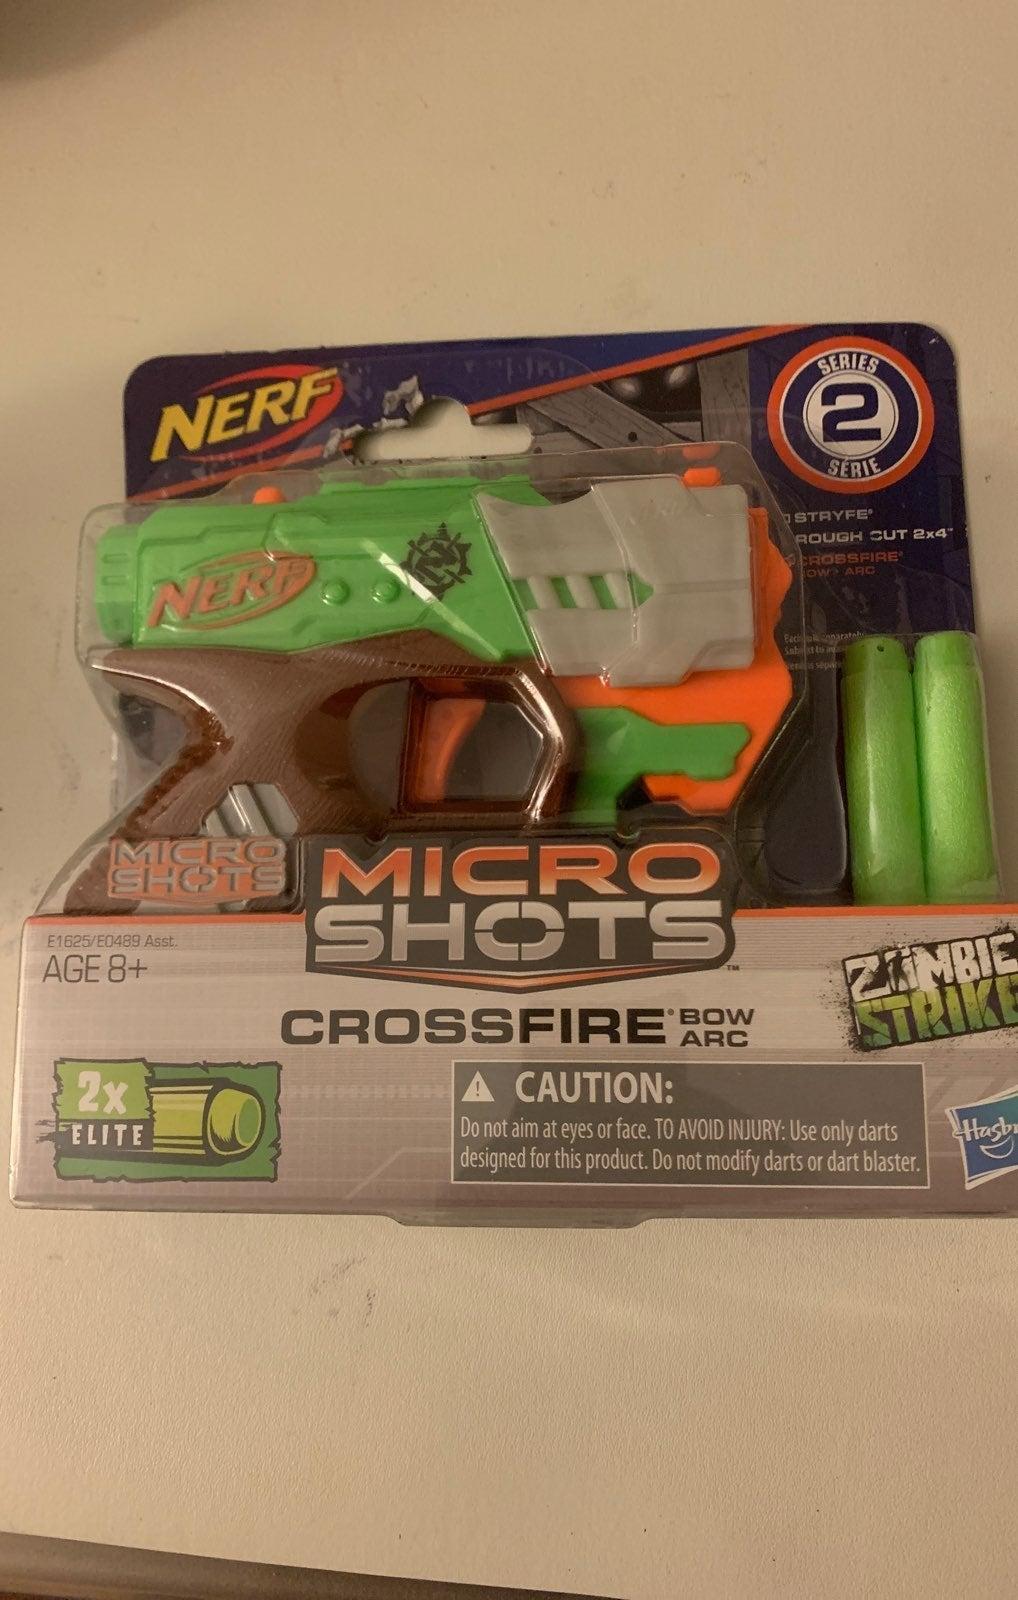 NERF CROSSFIRE BOW ARC MICRO SHOTS